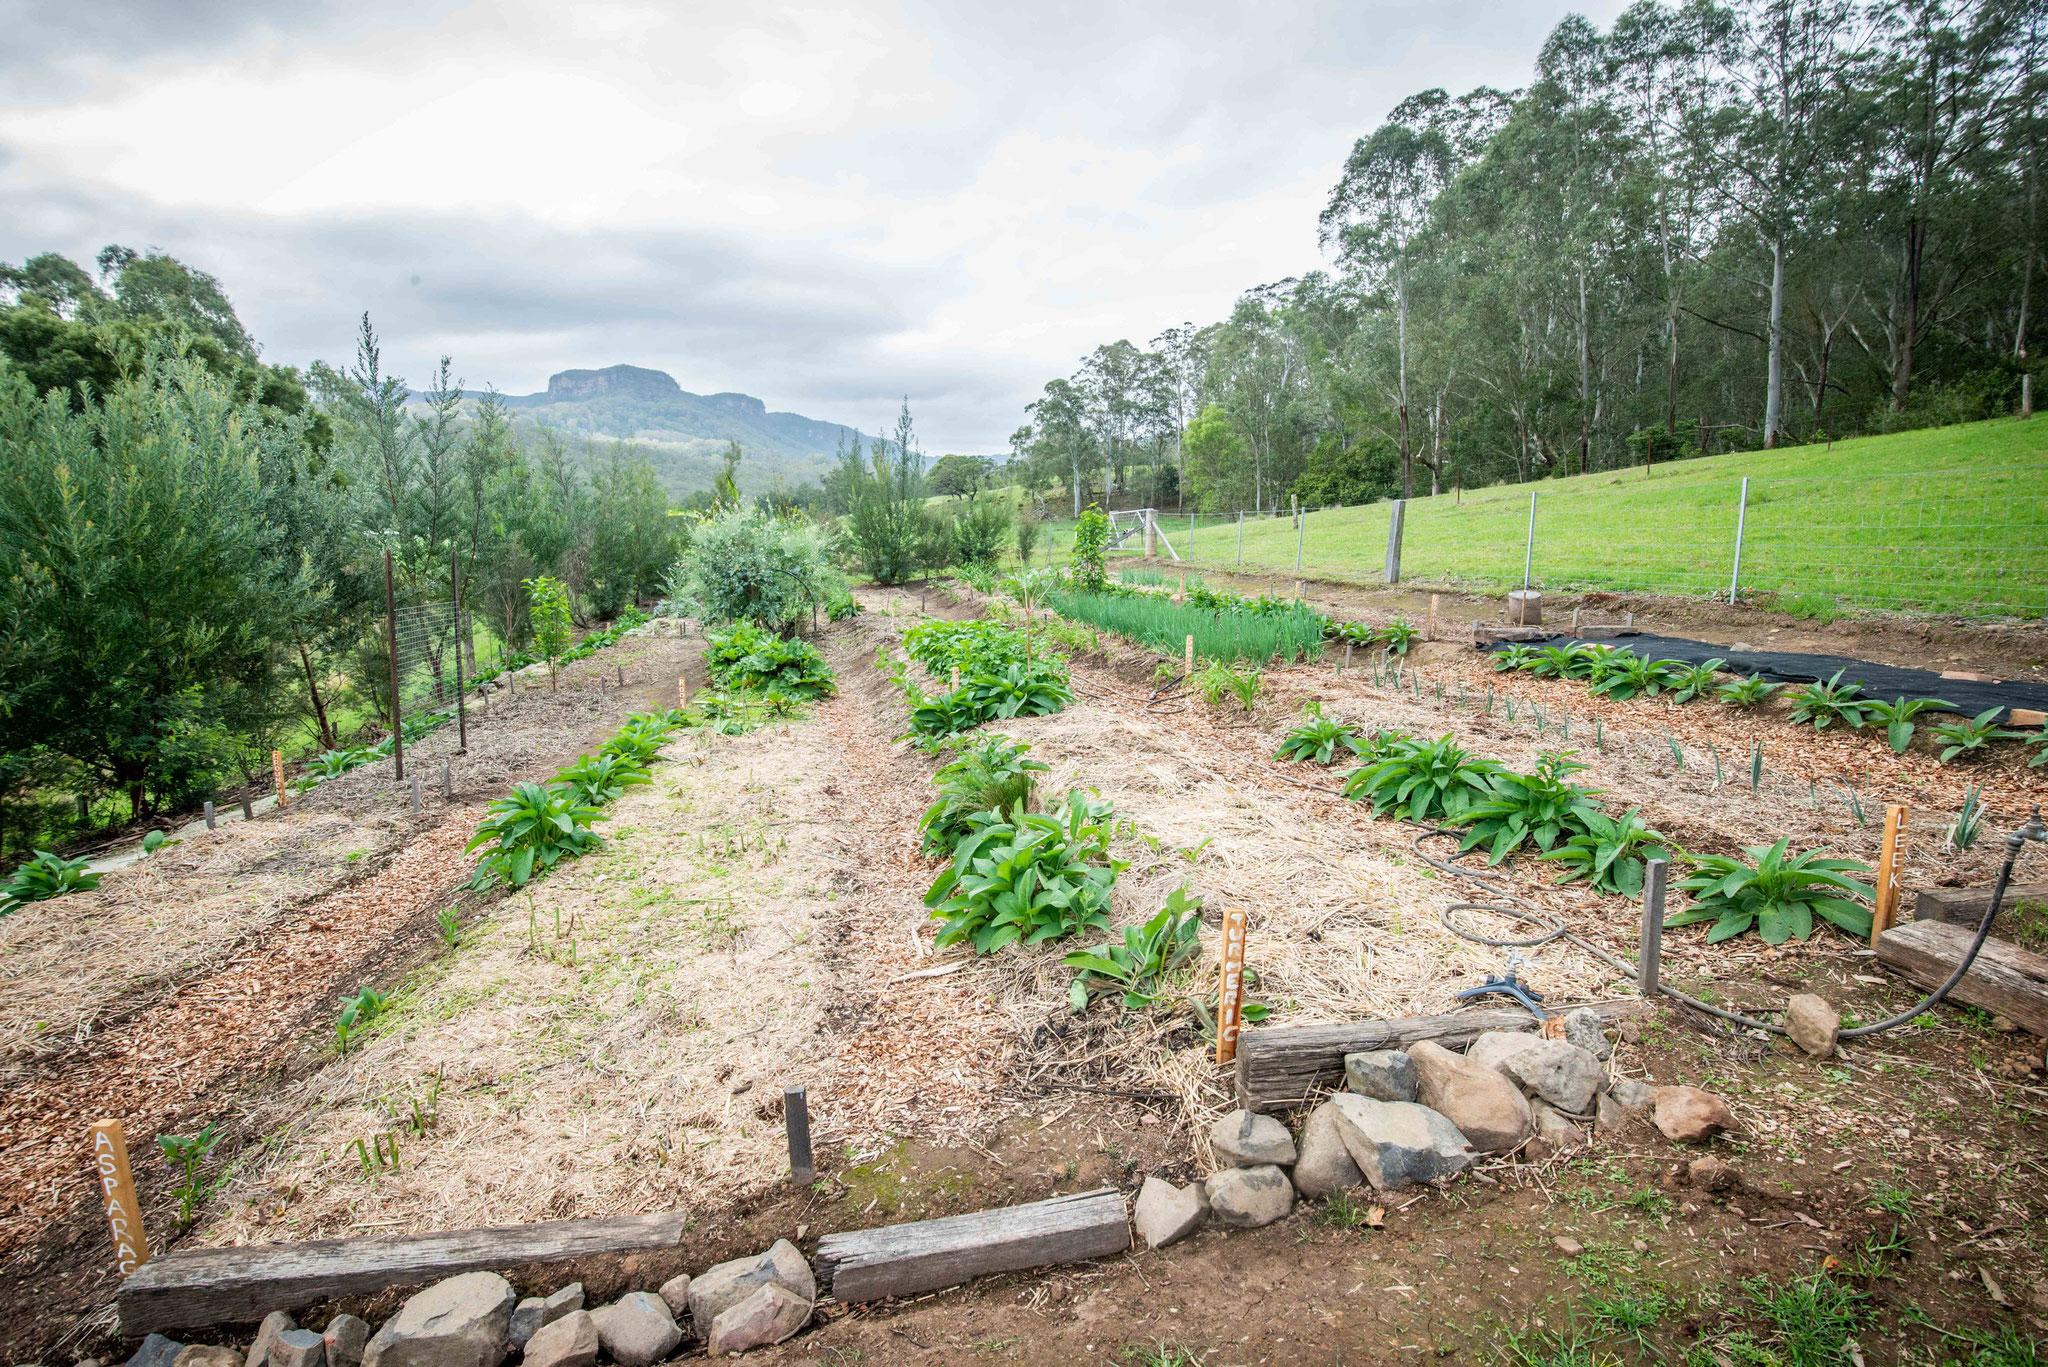 Le jardin des vivaces - the perenial garden